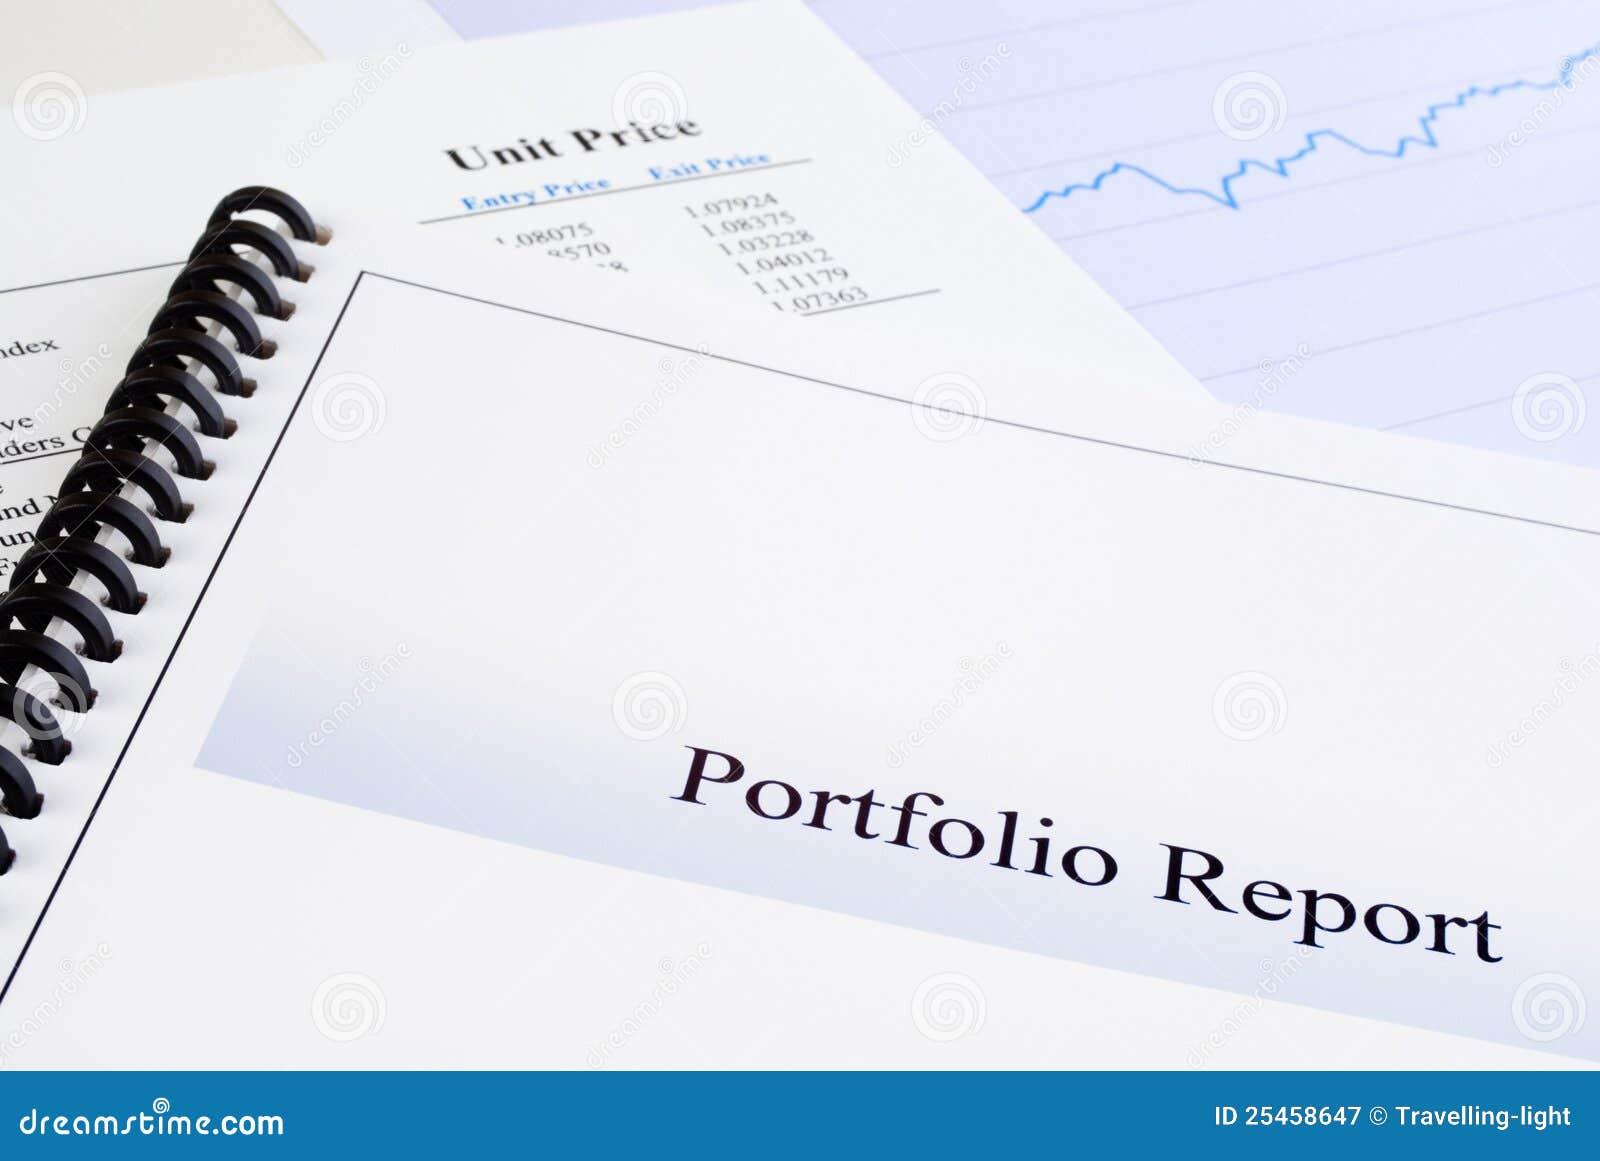 portfolio report stock image  image of booklet  financial